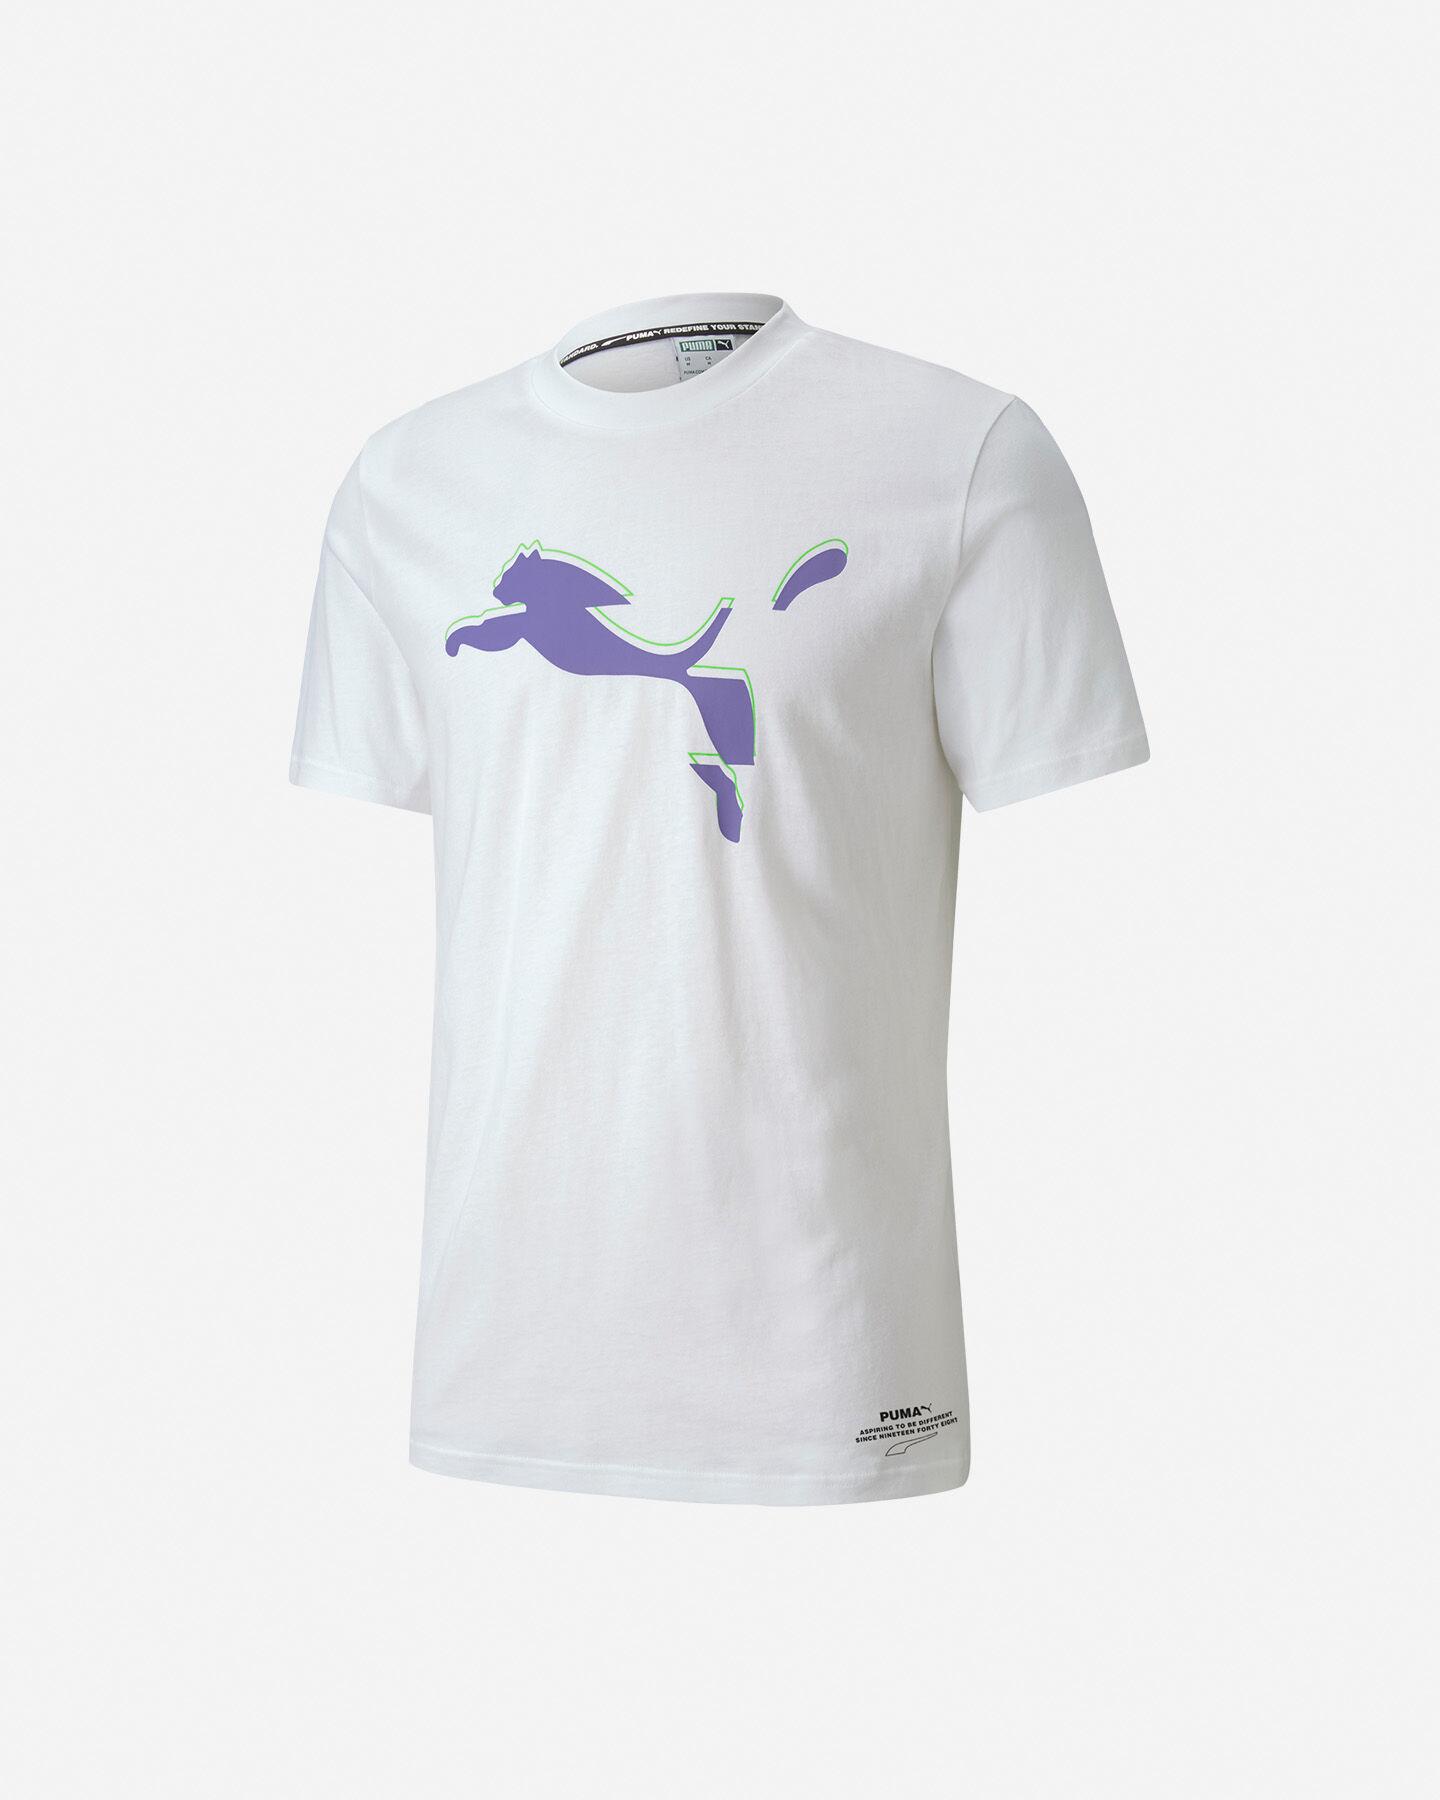 T-Shirt PUMA AVENIR GRAPHIC LOGO M S5235572 scatto 0